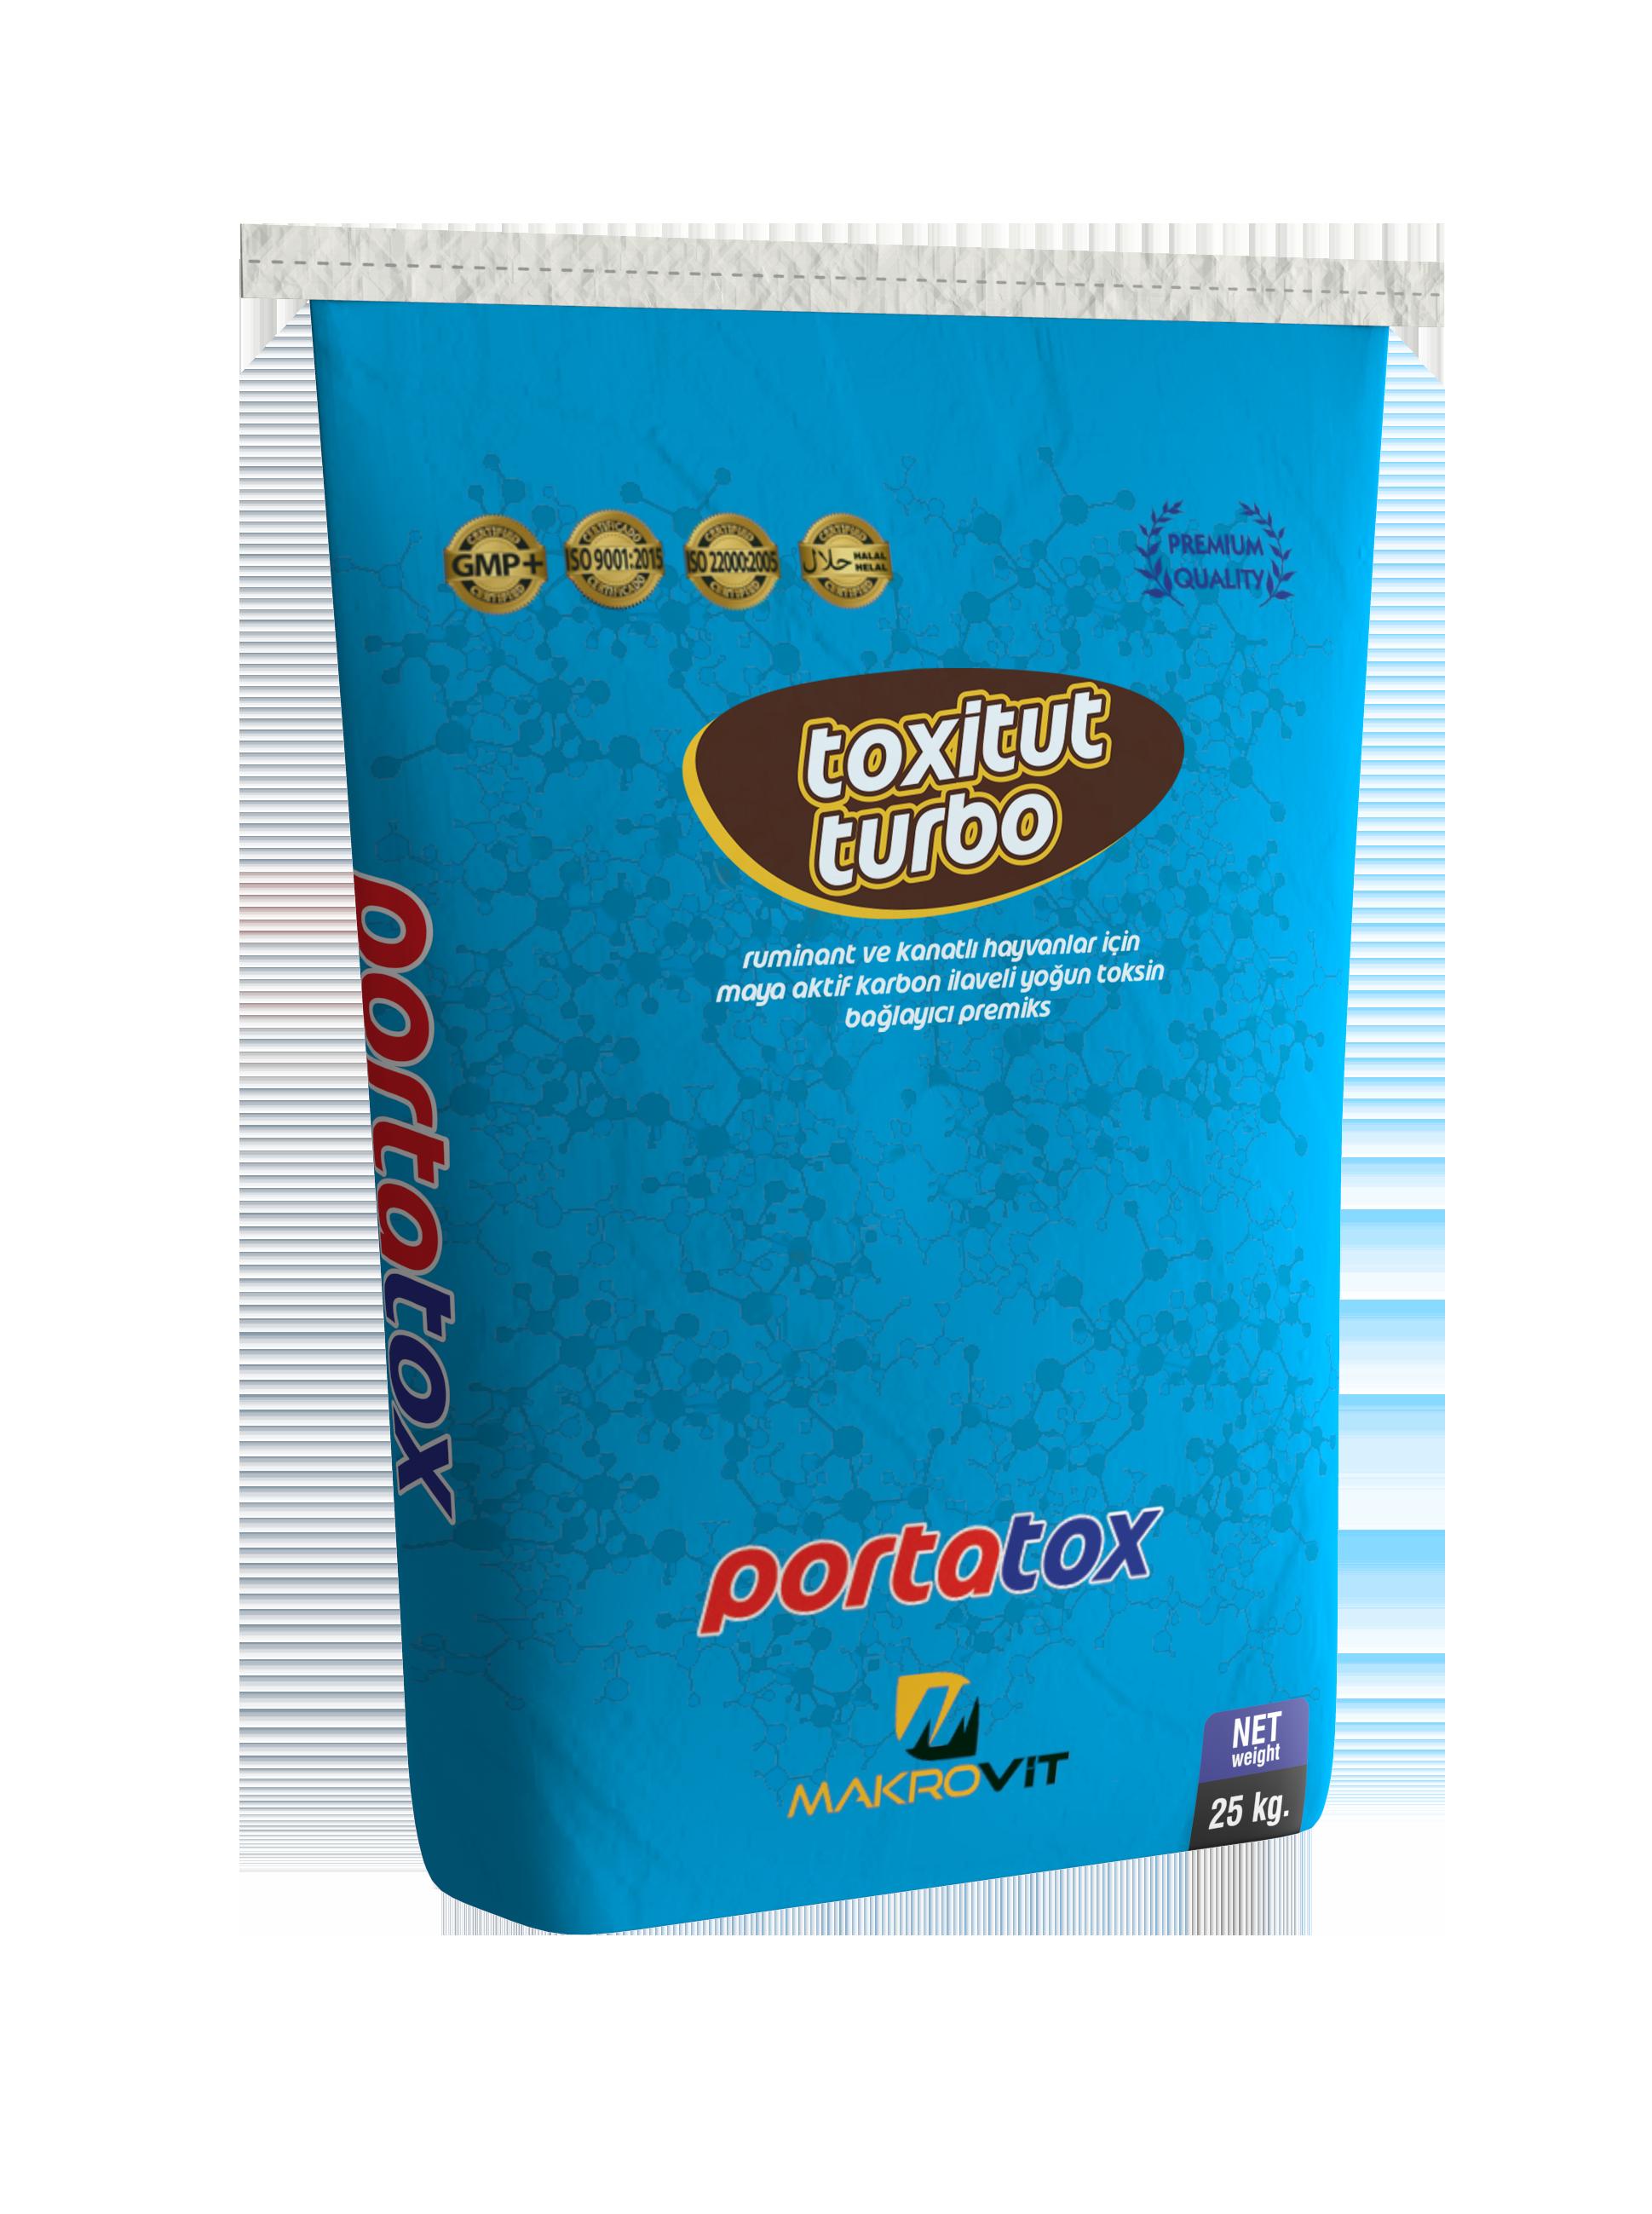 Portatox Toxitut Turbo